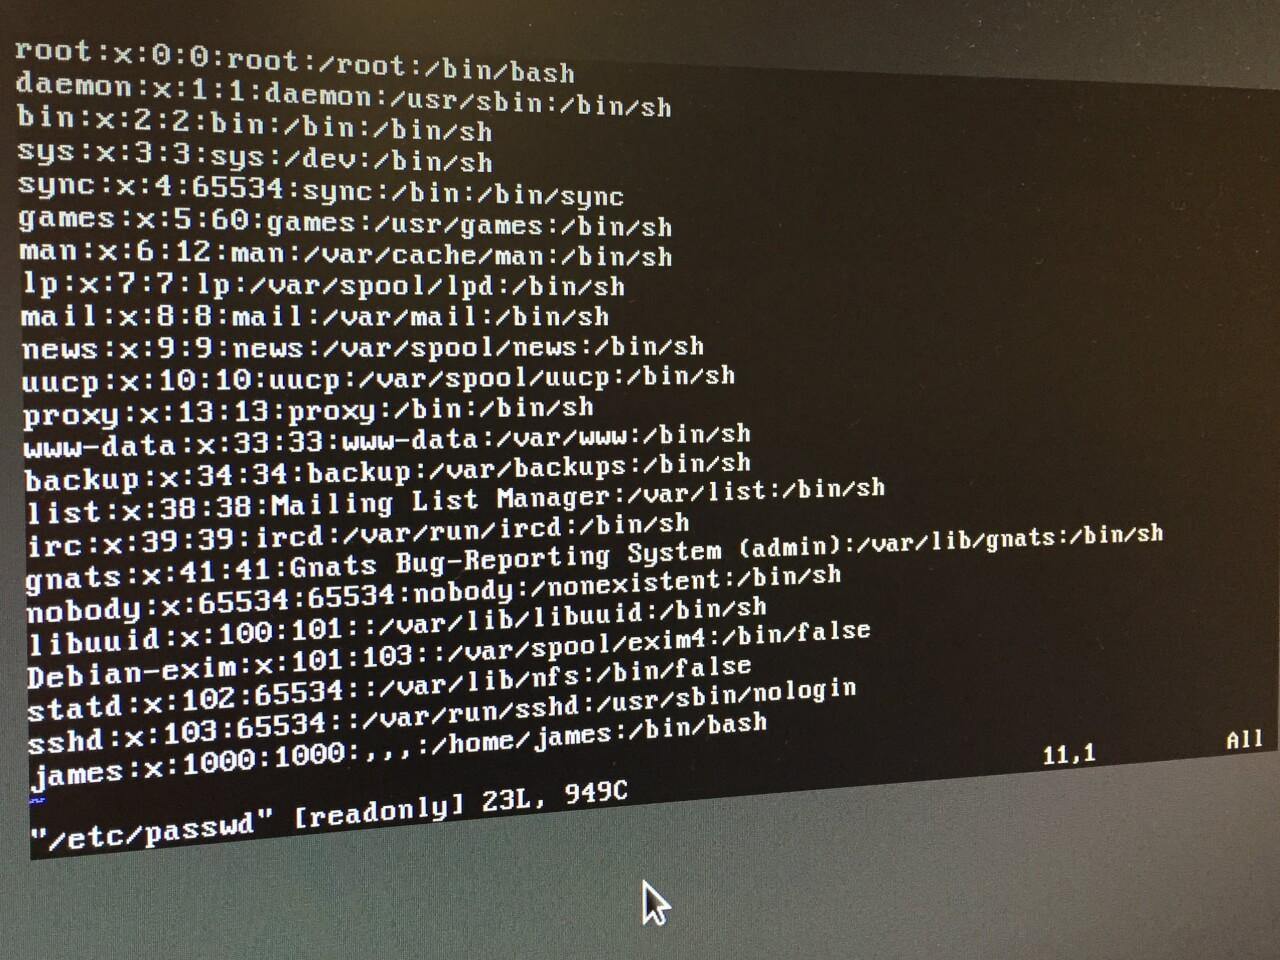 Computer Science at Warwick Q&A (Part 1)